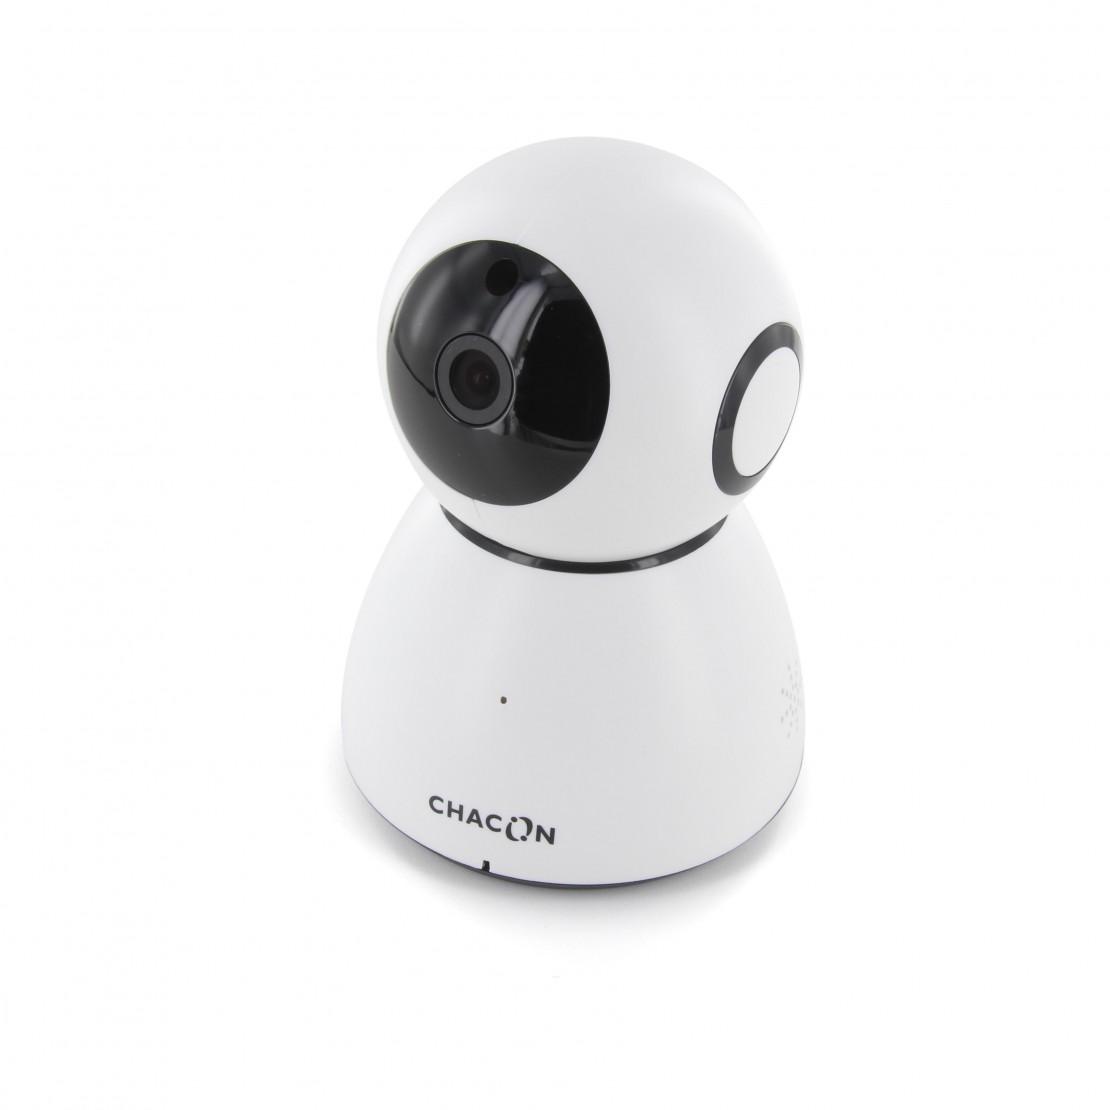 Caméra Wi-Fi HD 1080P rotative